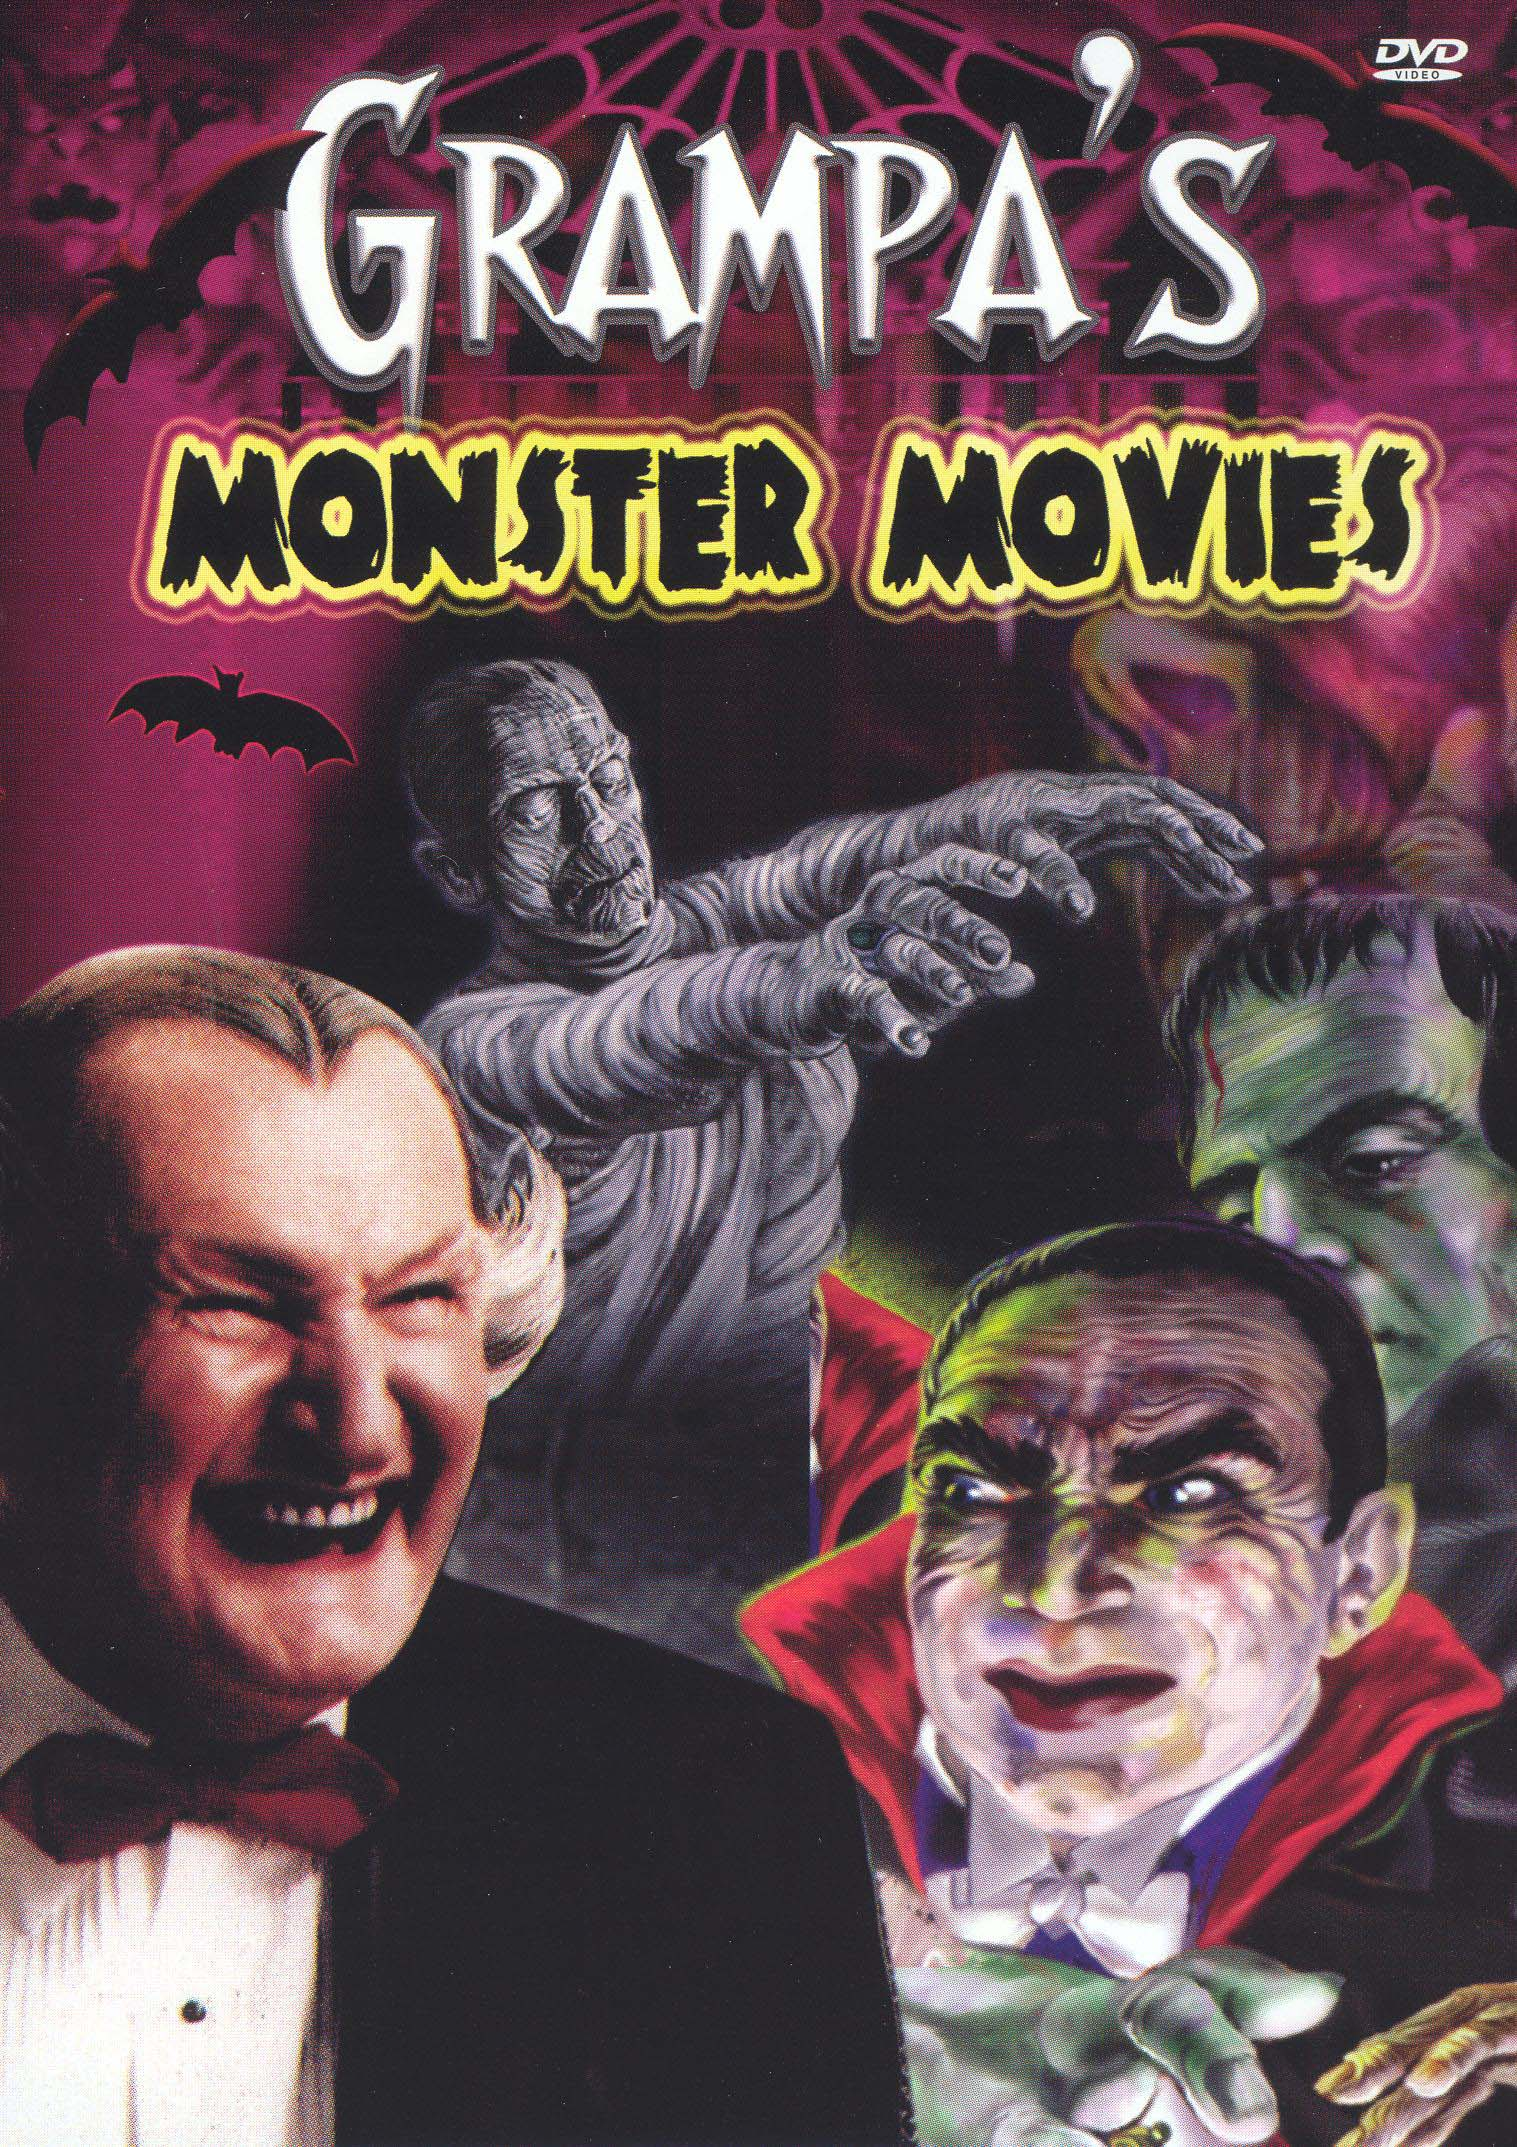 Grampa's Monster Movies